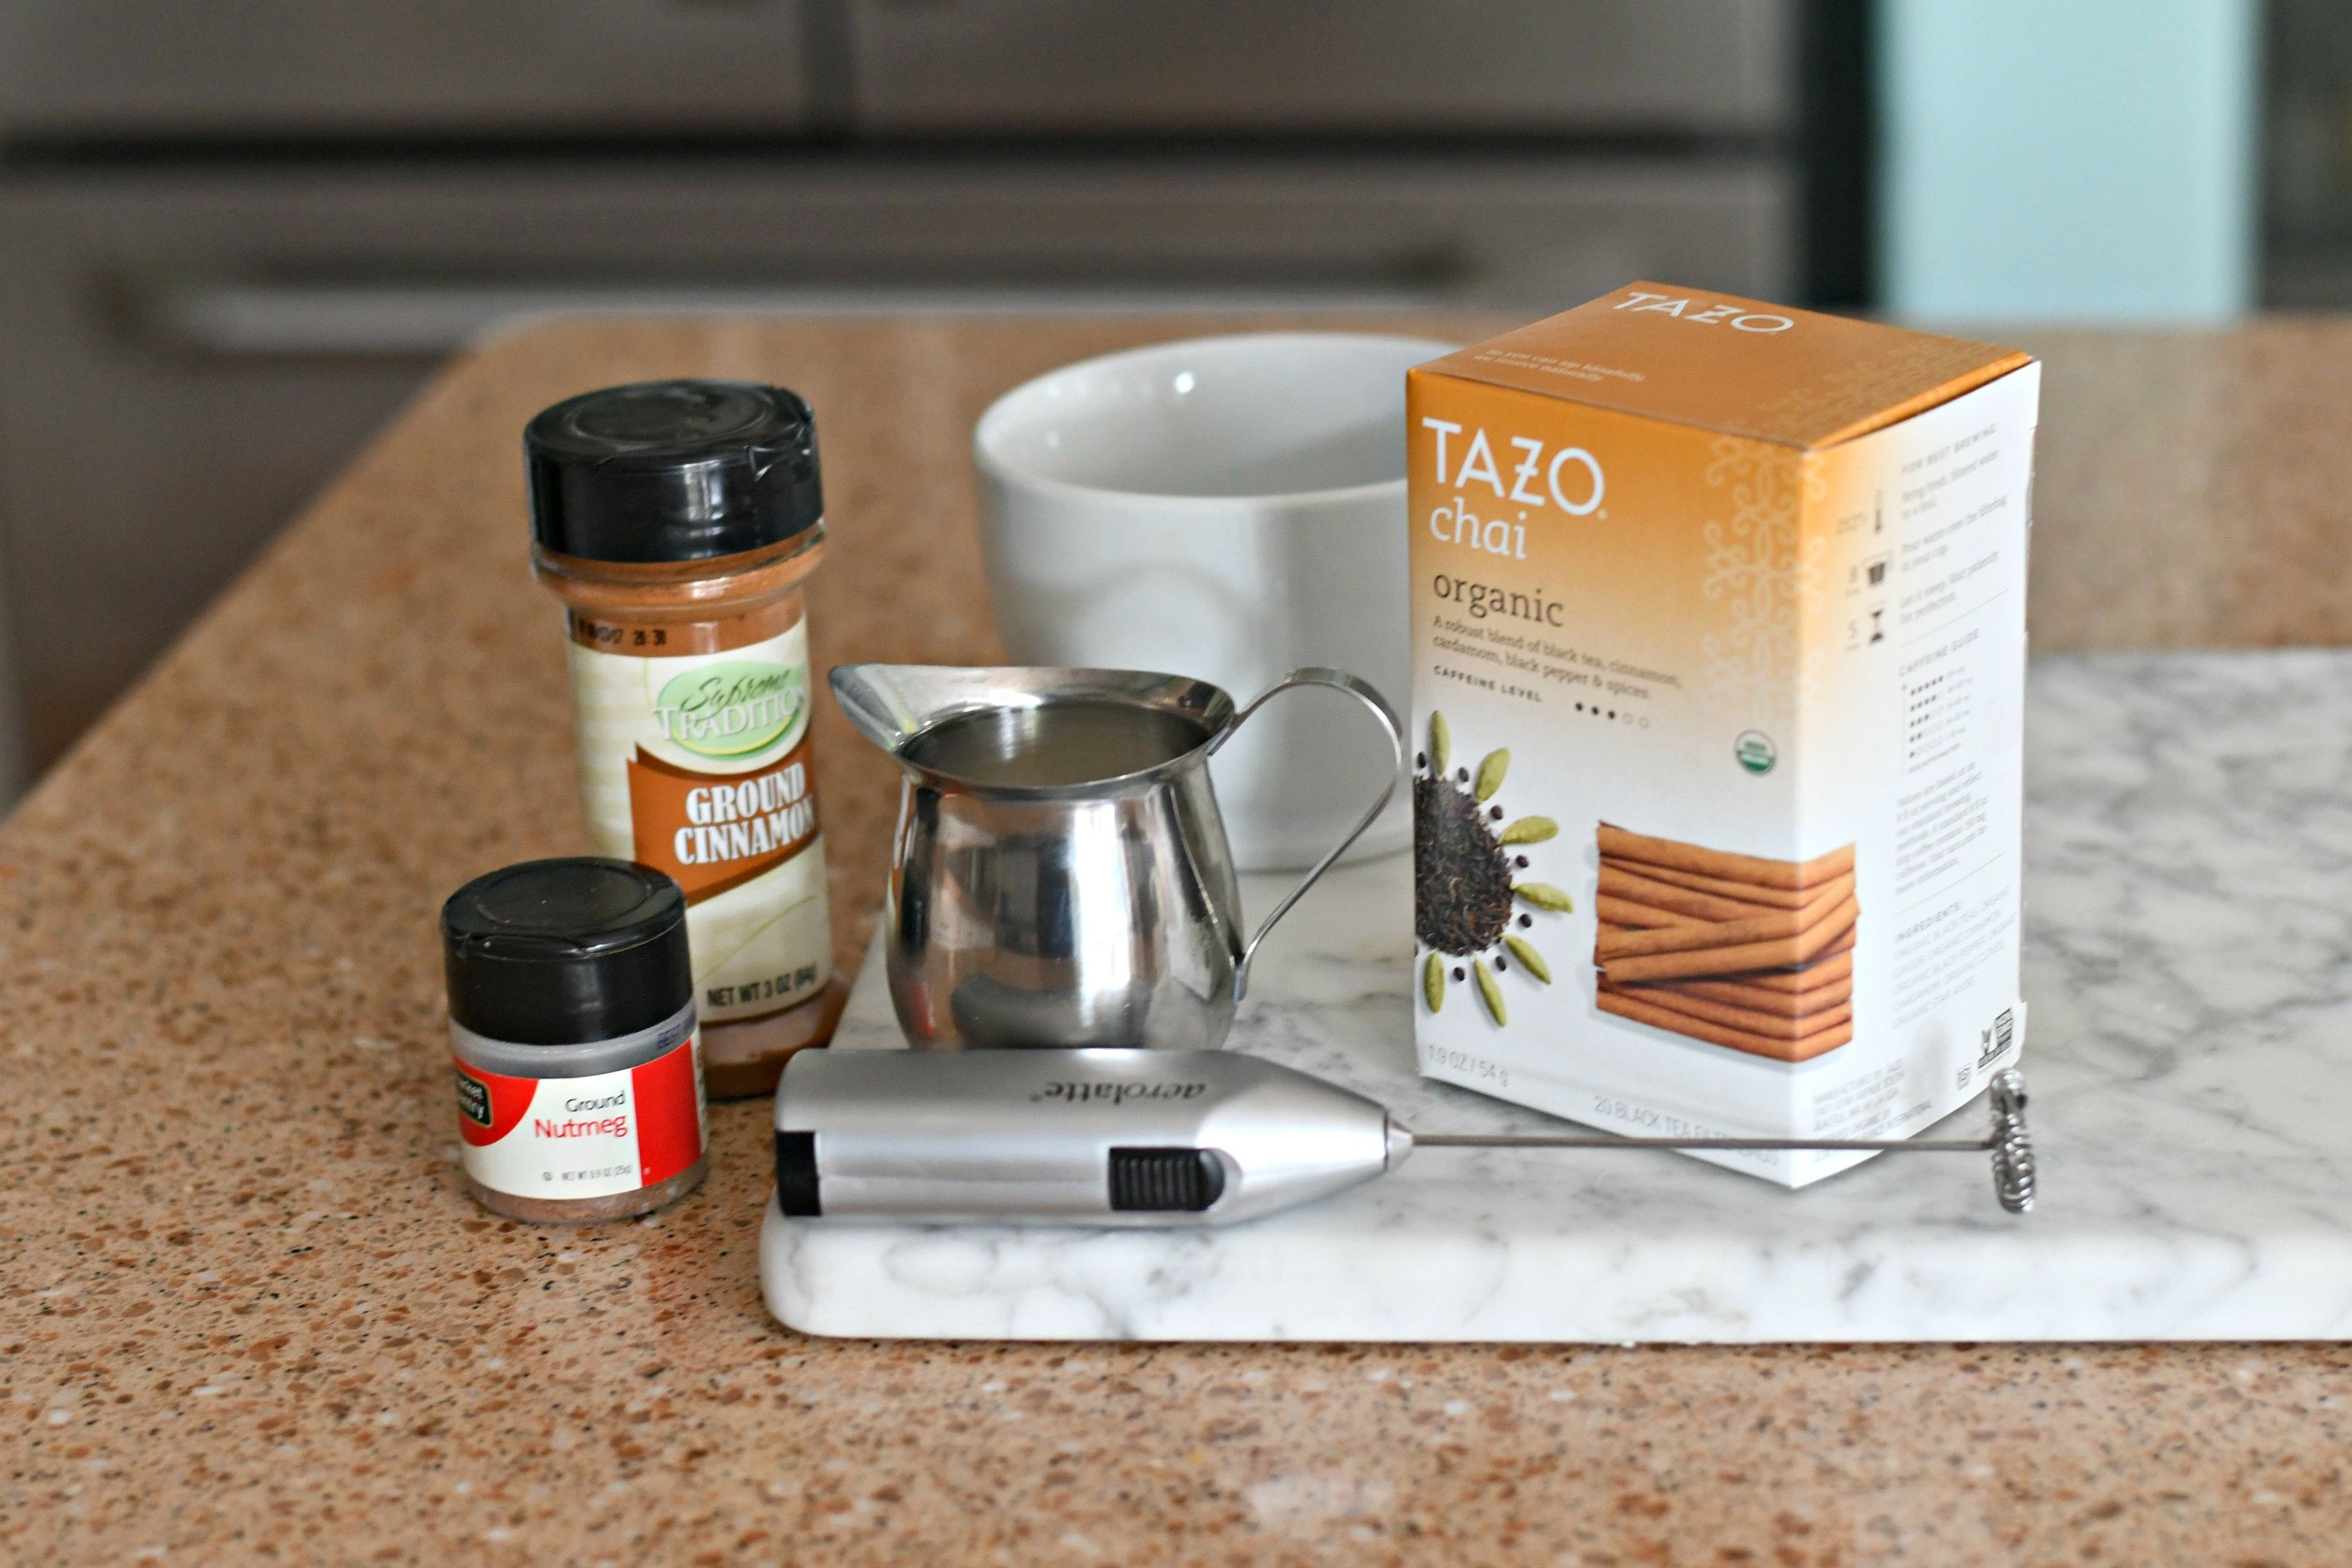 Ingredients to make your own diy starbucks chai latte